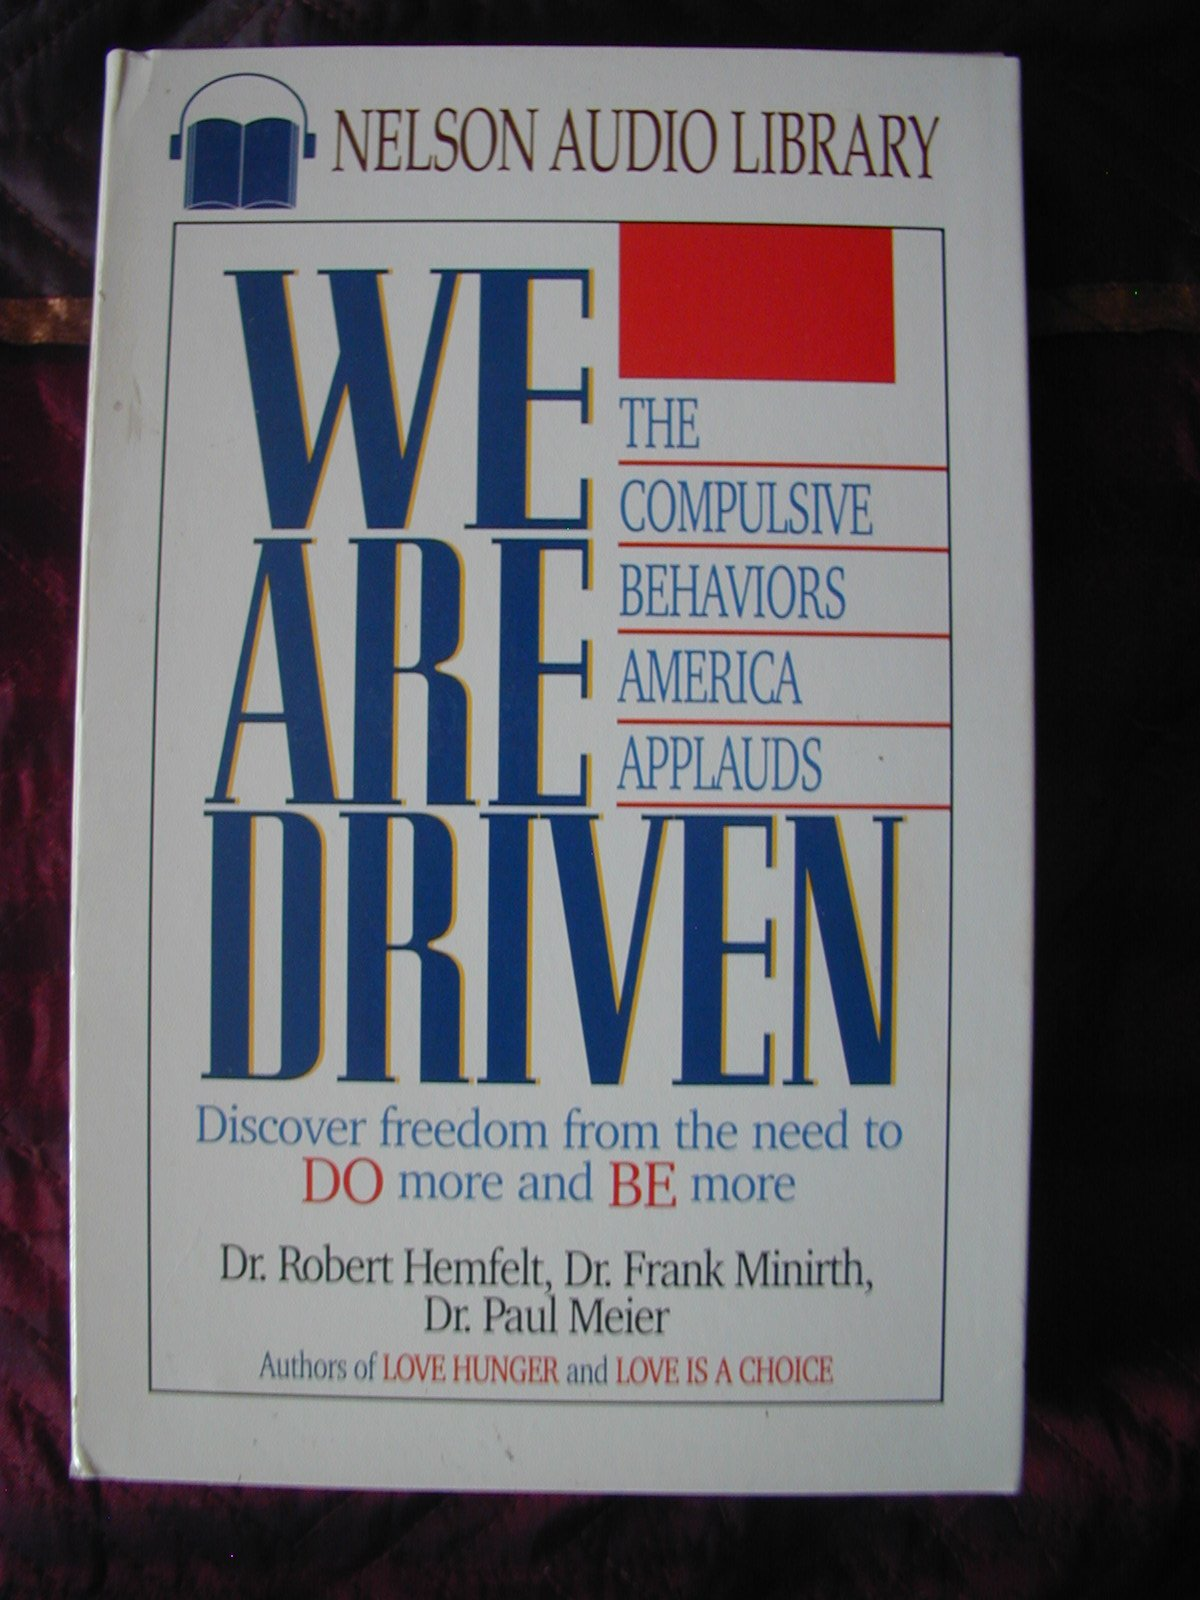 We Are Driven: Amazon.co.uk: Robert Hemfelt, Paul Meier, Frank Minirth:  9780840799760: Books